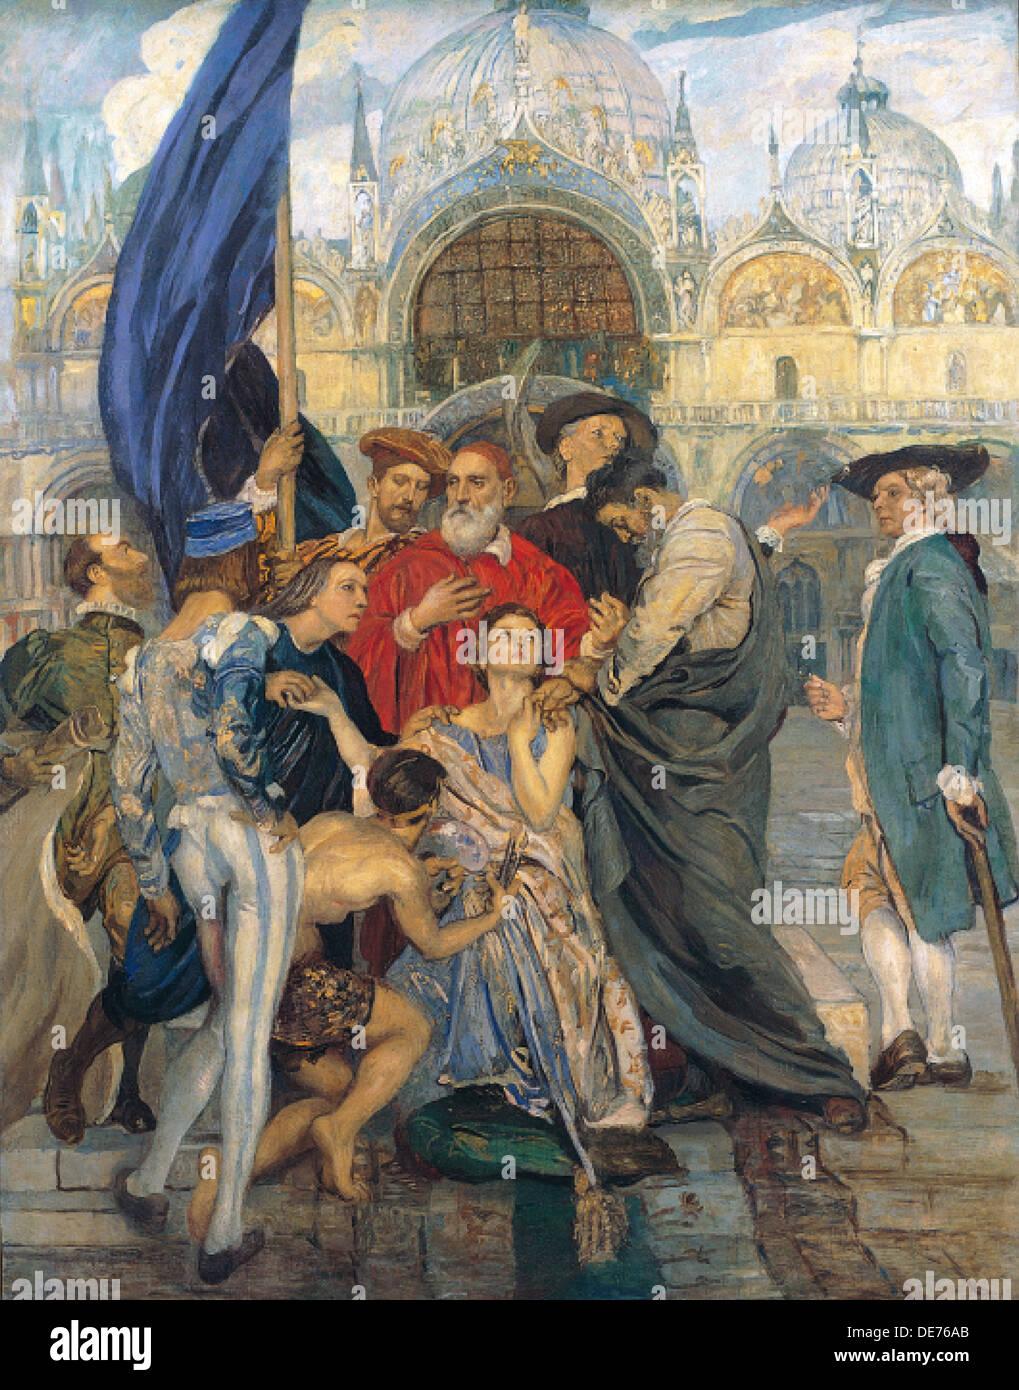 The Venetian Painters, 1937. Artist: Tito, Ettore (1859-1941) - Stock Image